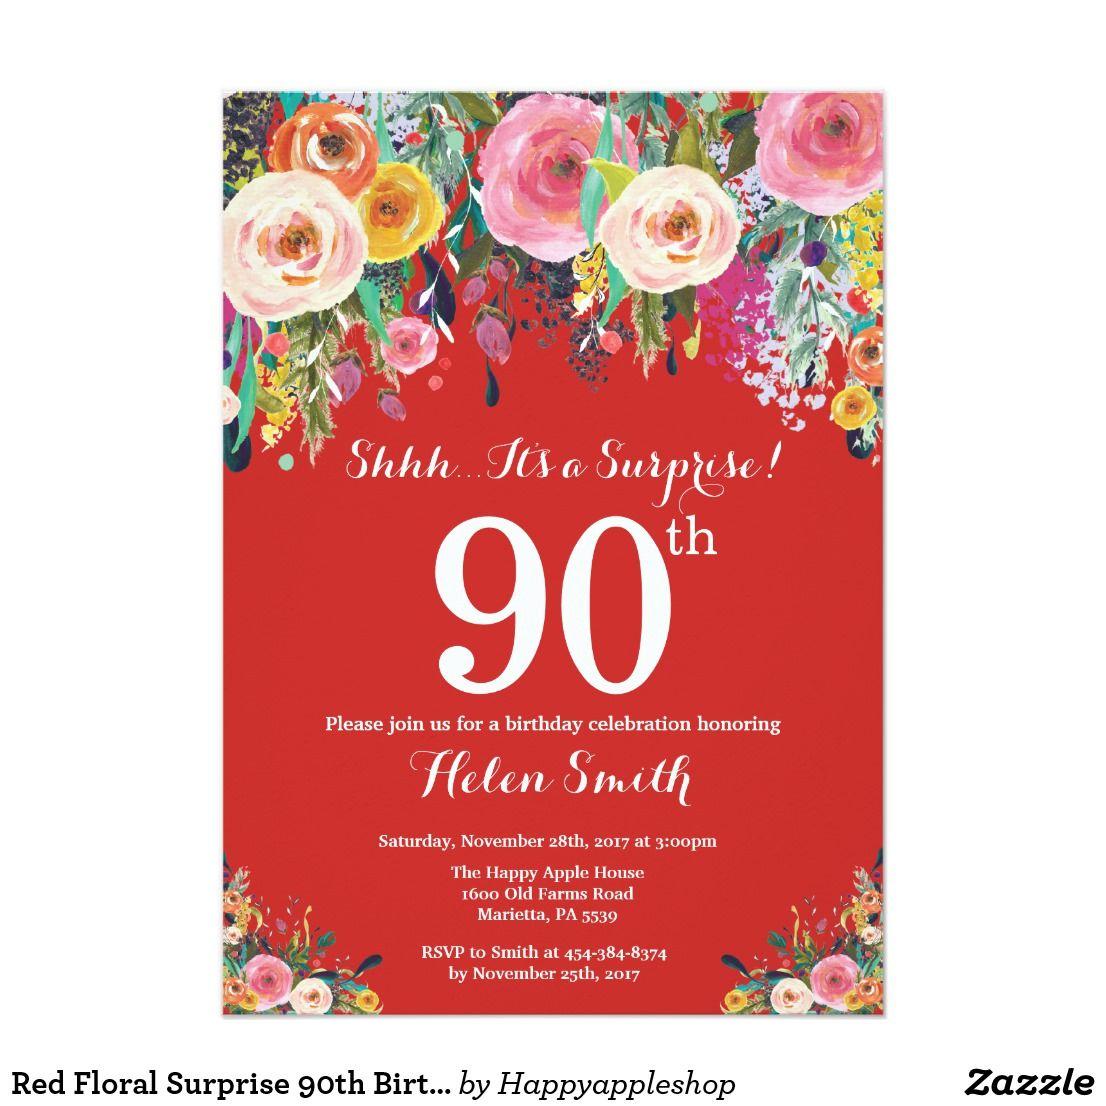 Red Floral Surprise 90th Birthday Invitation | Birthday Invitation ...